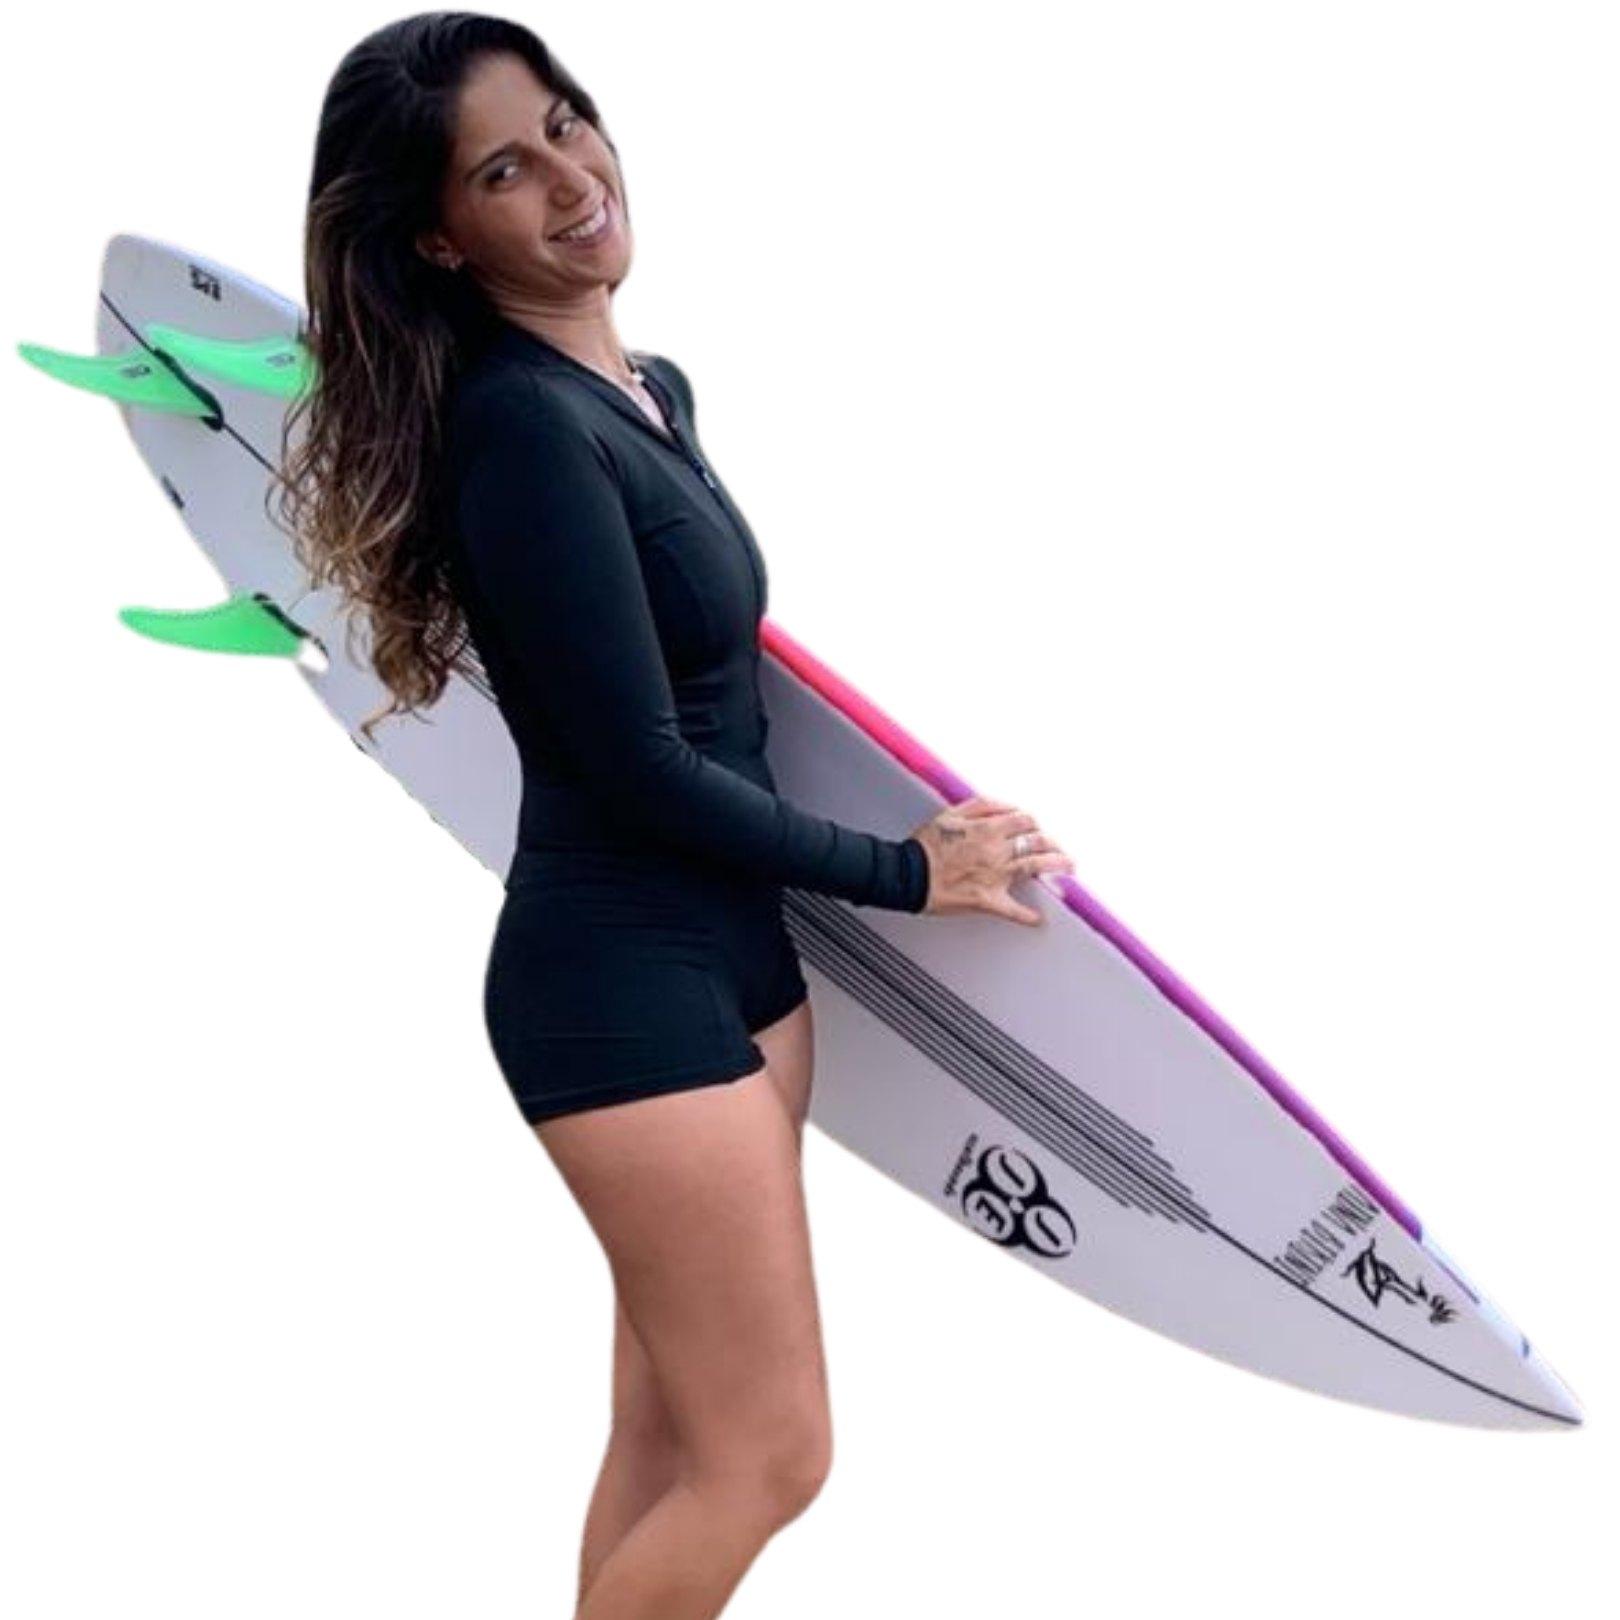 MAIÔ SURF ZÍPER MANGA LONGA ITAÚNA - Preto